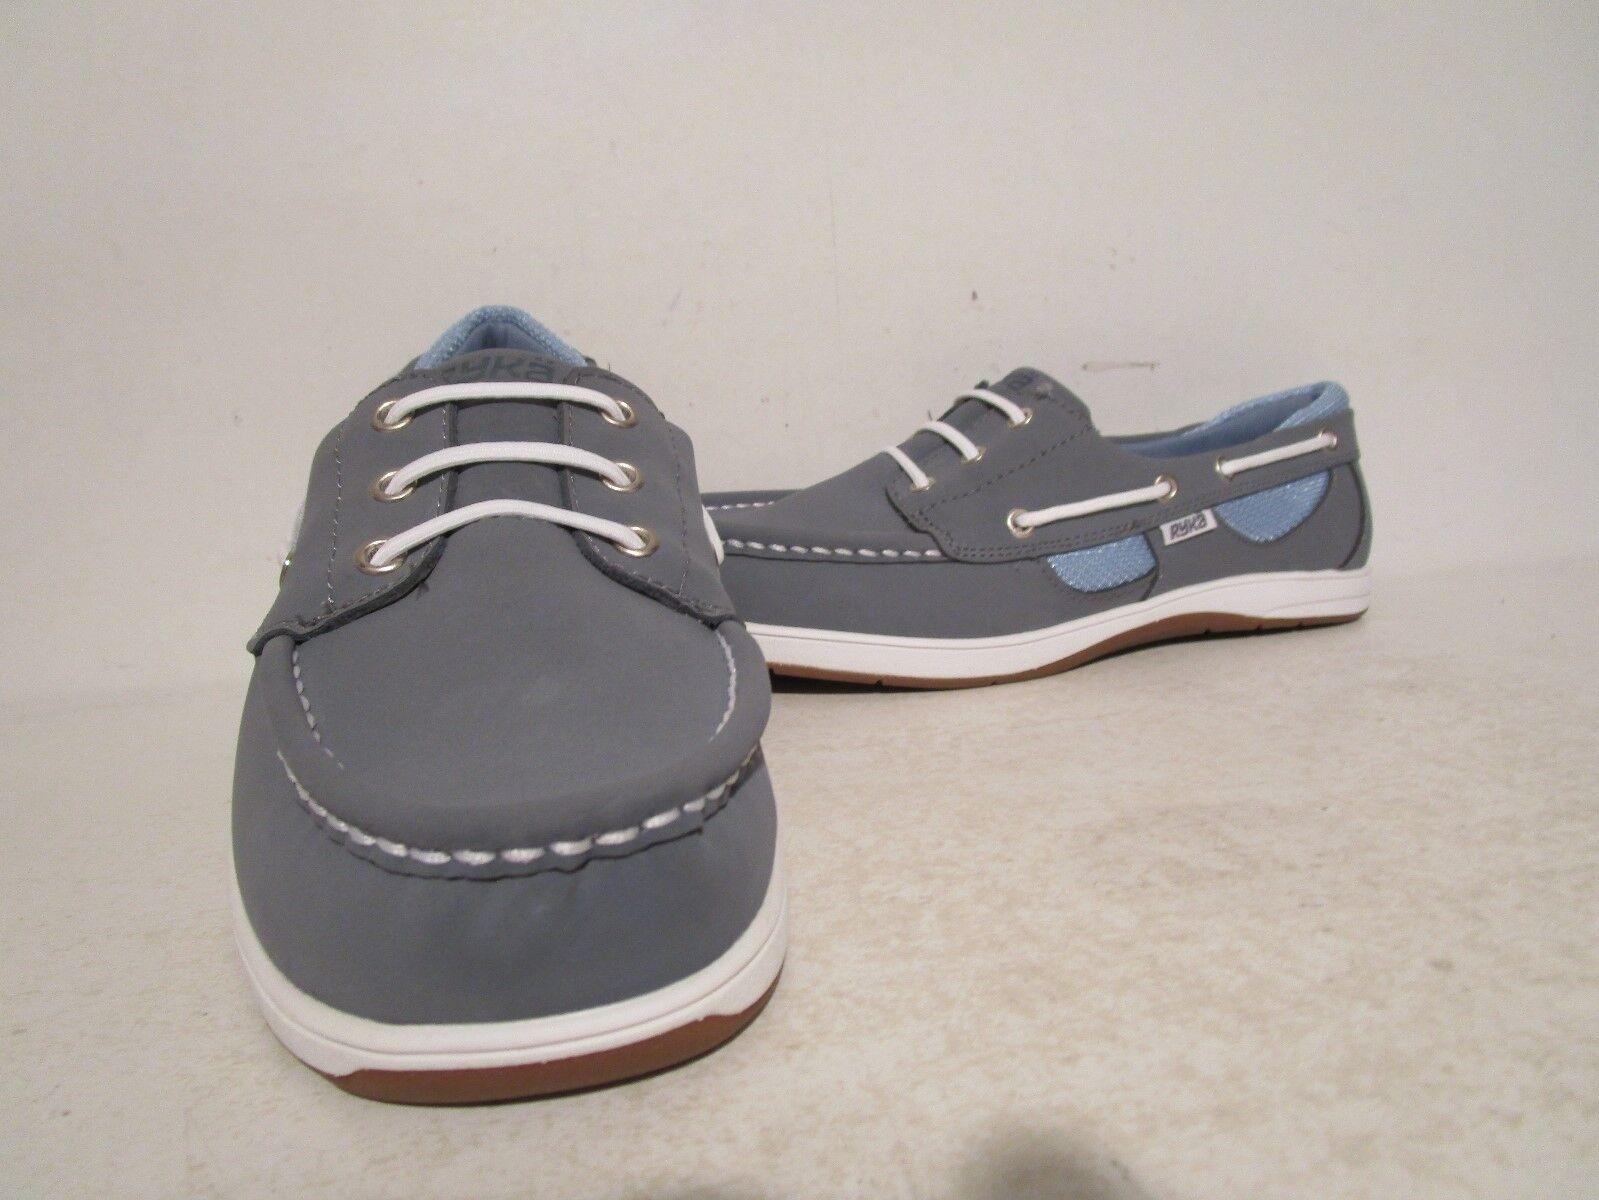 Ryka Womens Nubuck Leather Fabric Slip On Boat shoes bluee White Size 7.5 W